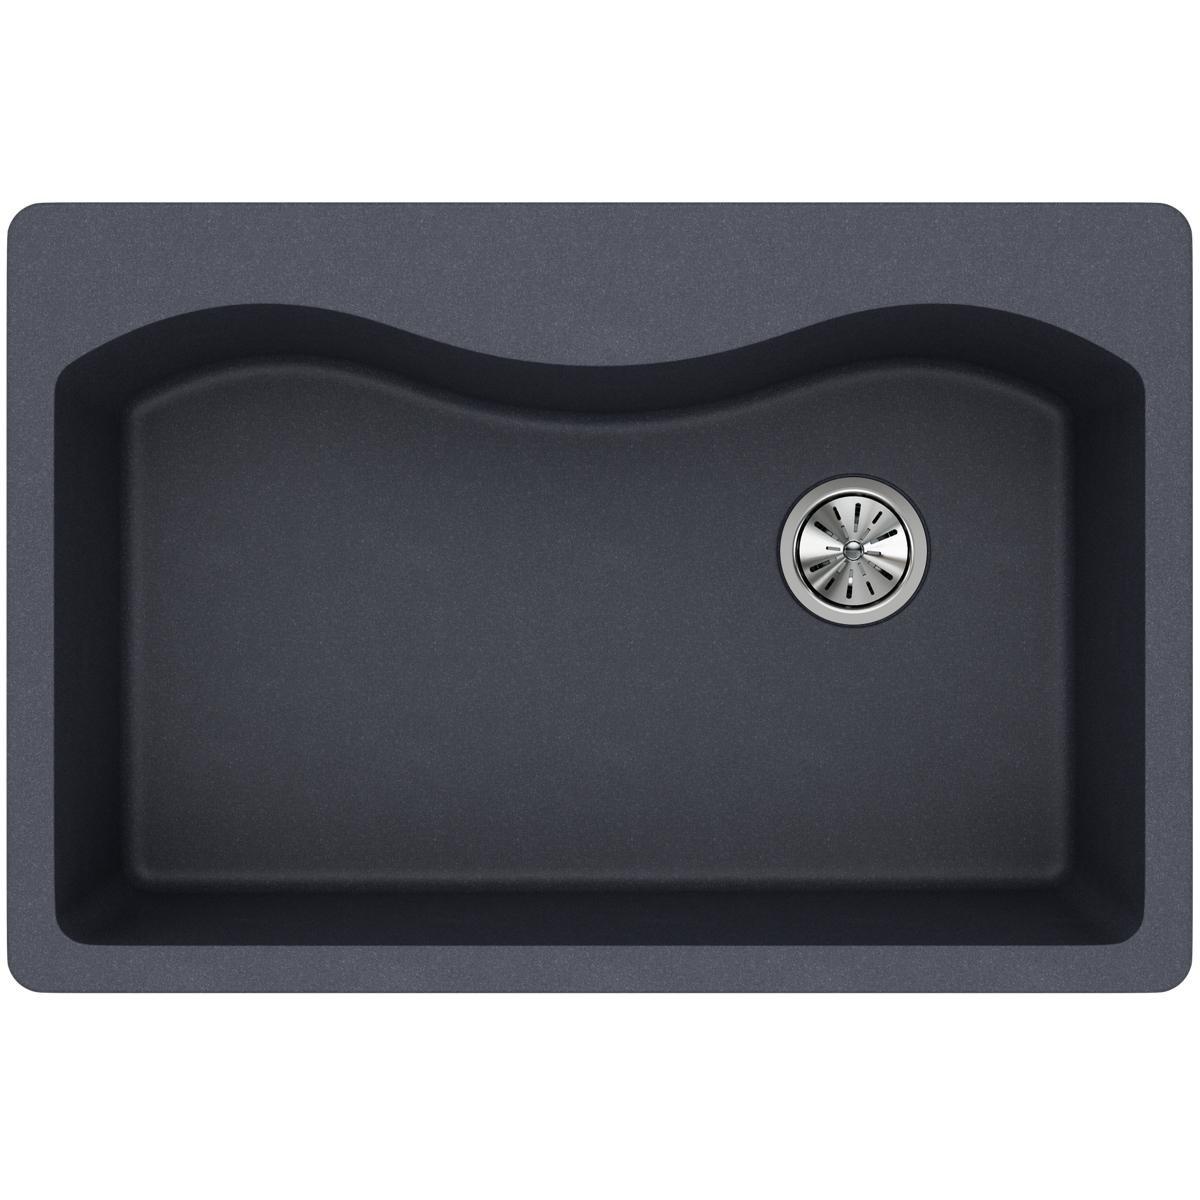 Elkay ELGS3322RGY0 Quartz Classic Single Bowl Drop-in Sink, Dusk Gray